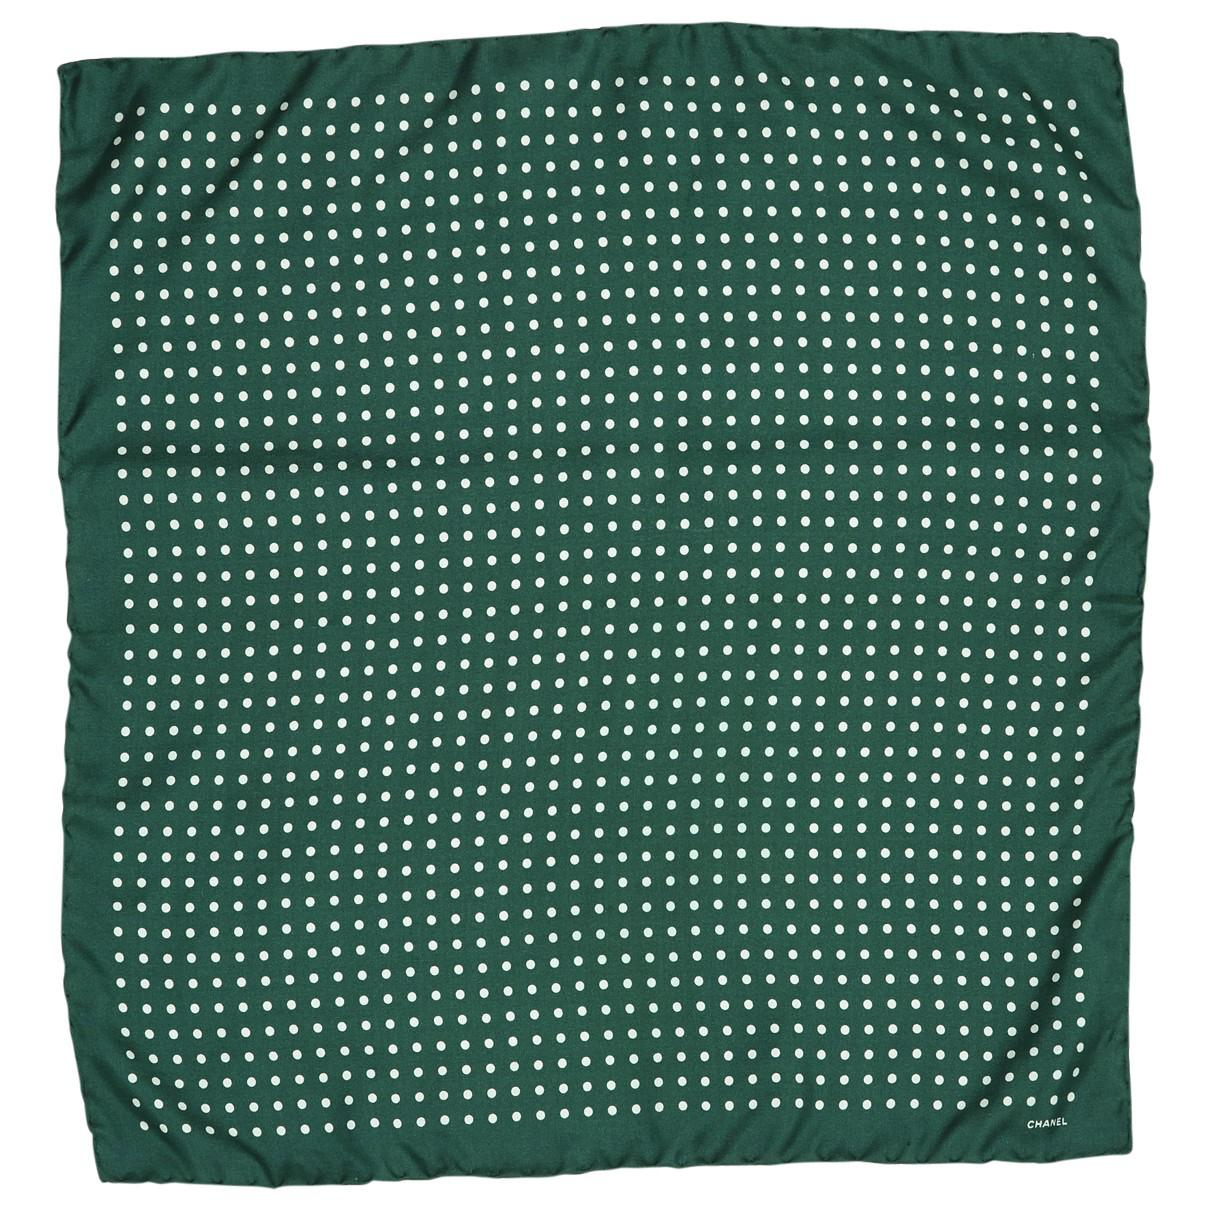 31c5c7e1790 Chanel Green Silk Scarves   Pocket Squares in Green for Men - Lyst